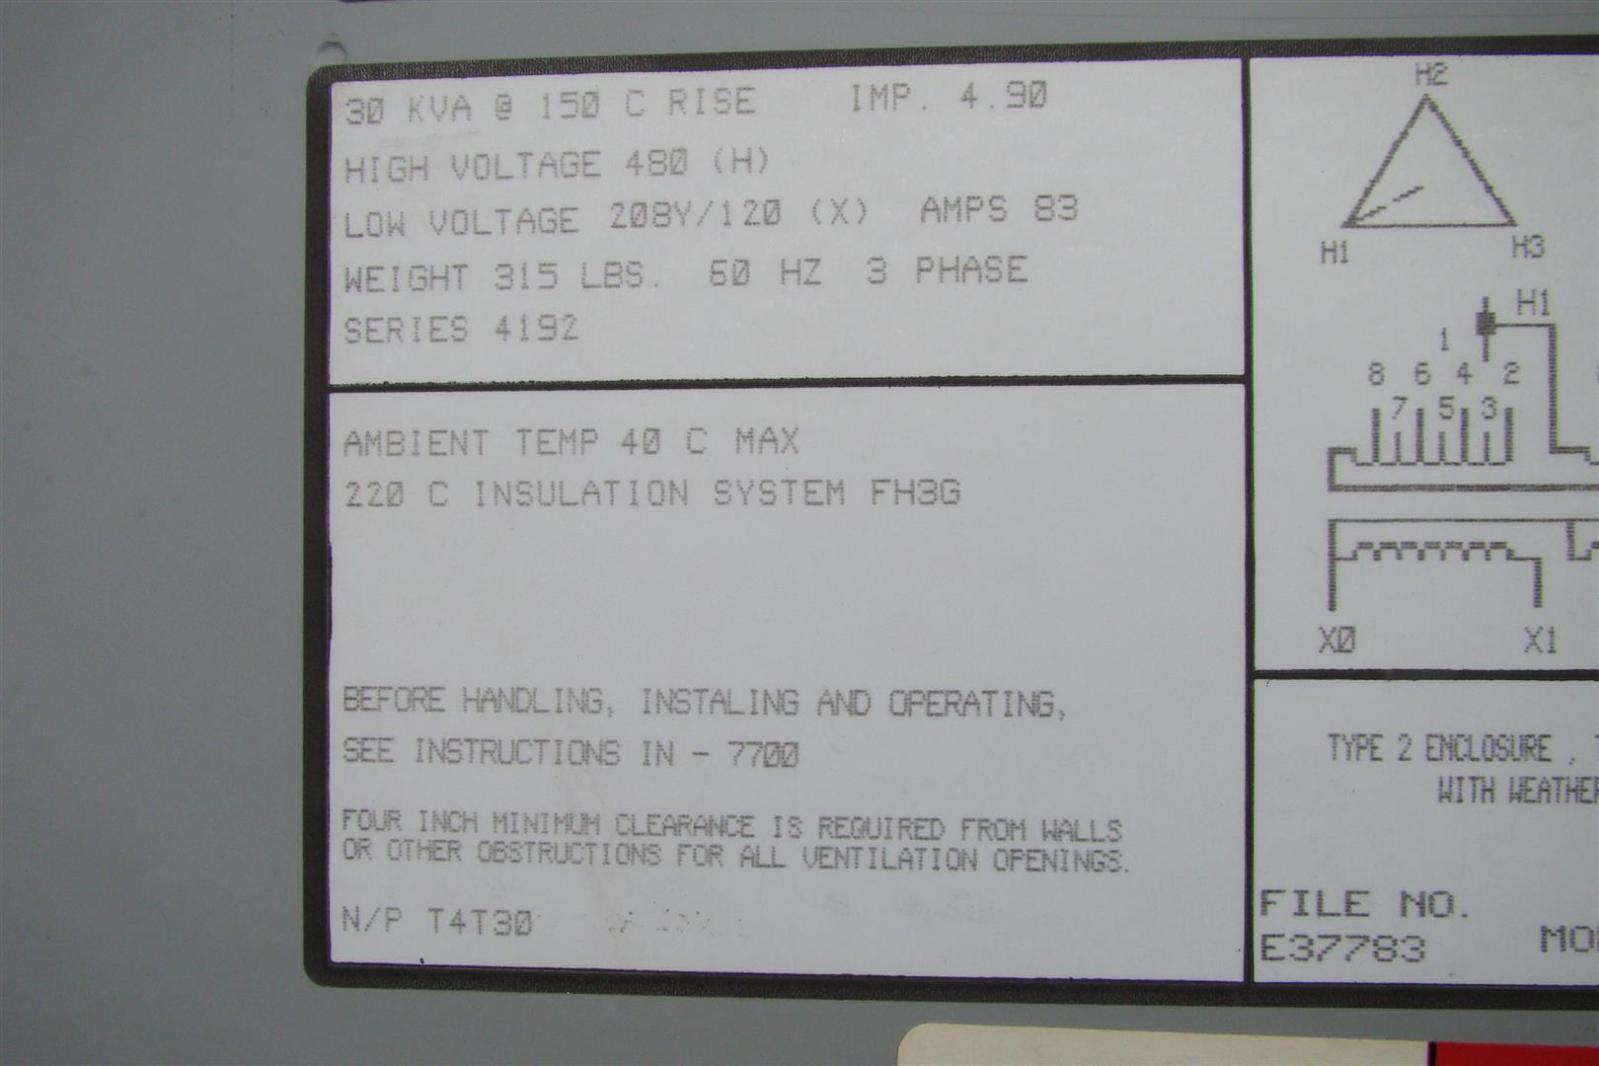 Siemens 30kva Dry Type Transformer Prim 480v Sec 208y 120v Wiring Diagram 3 Phase Panel 120 3f3y030st